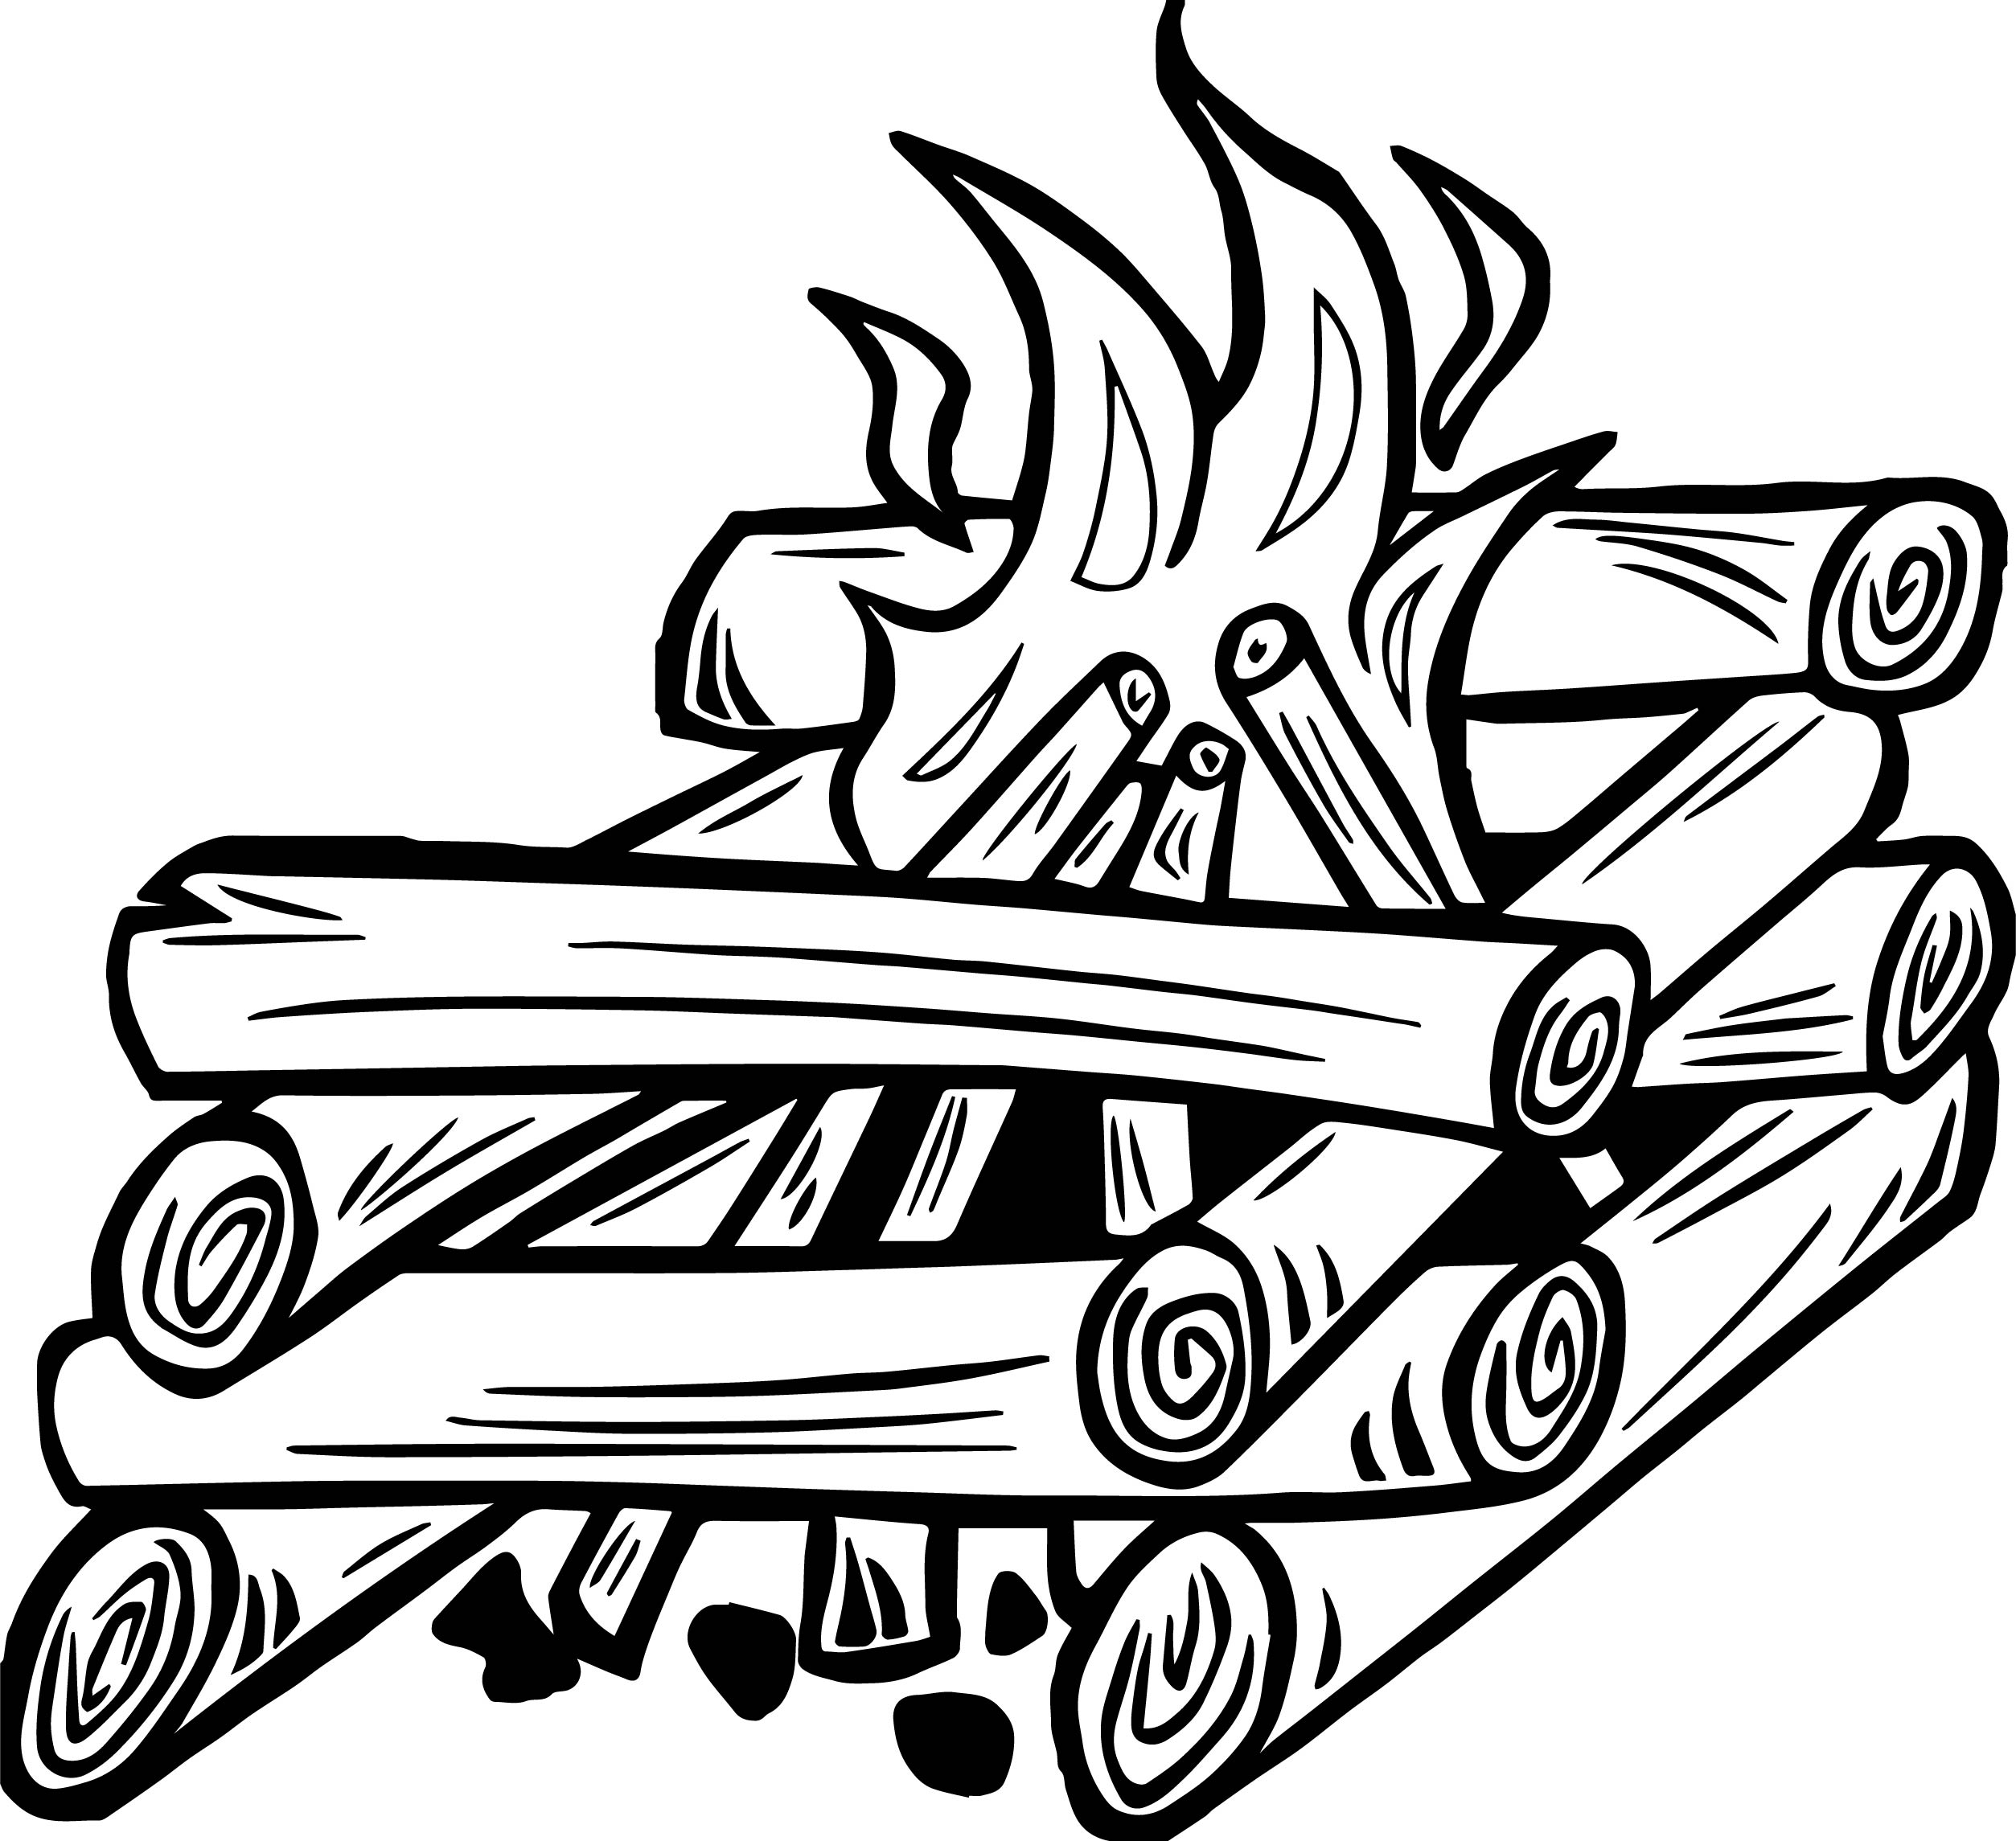 Campfire Fire Gif Coloring Page | Wecoloringpage.com